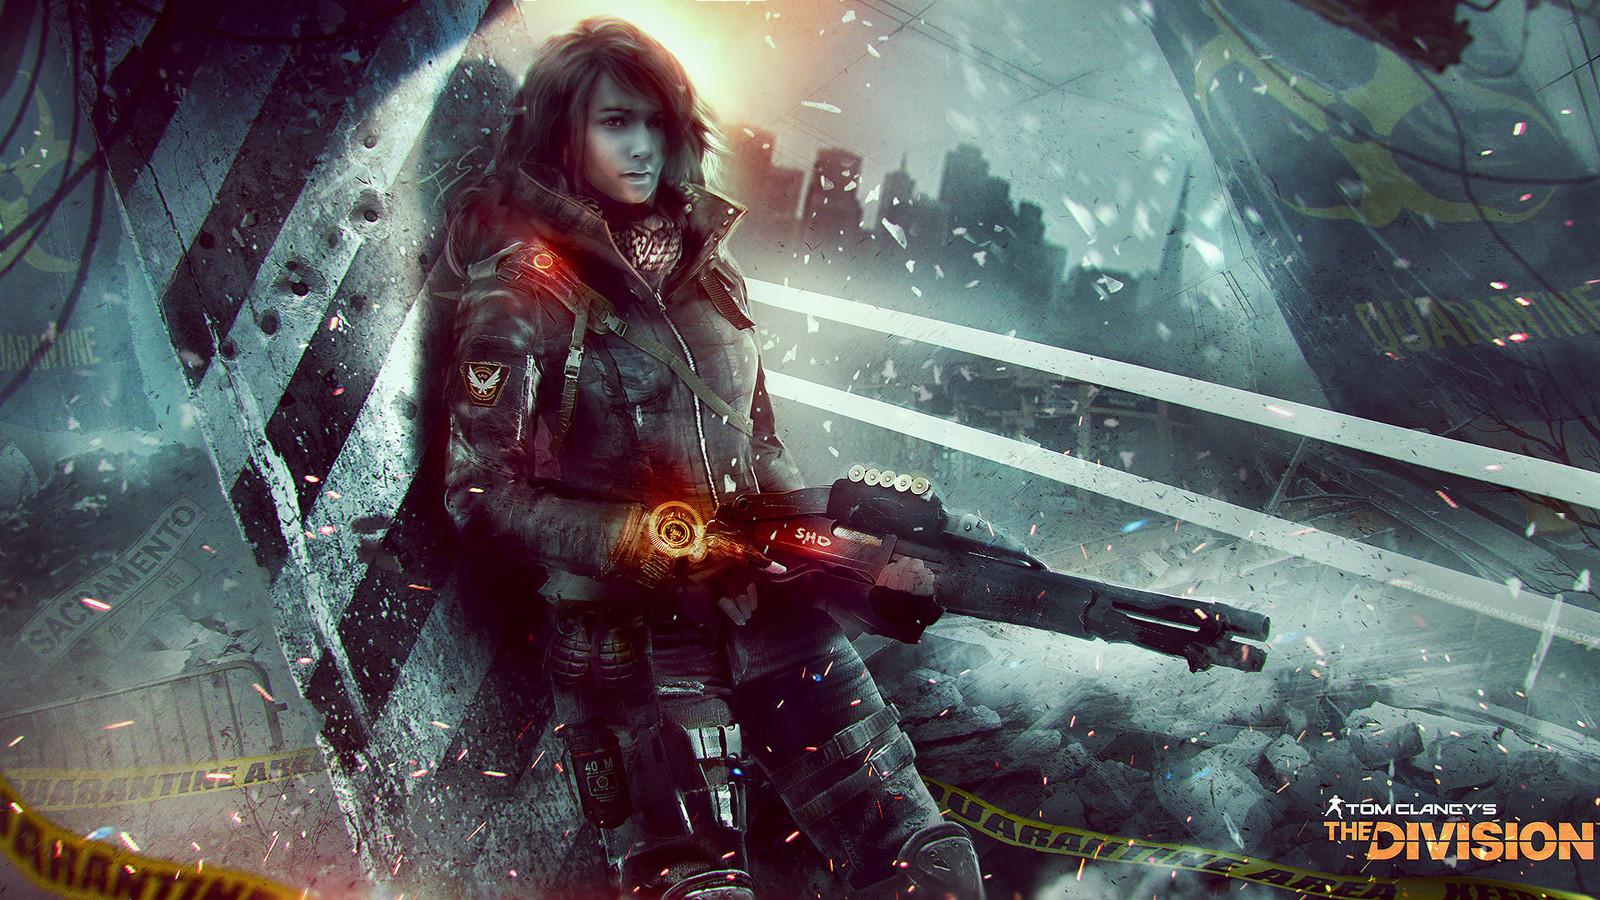 Agent Sophia - The Division